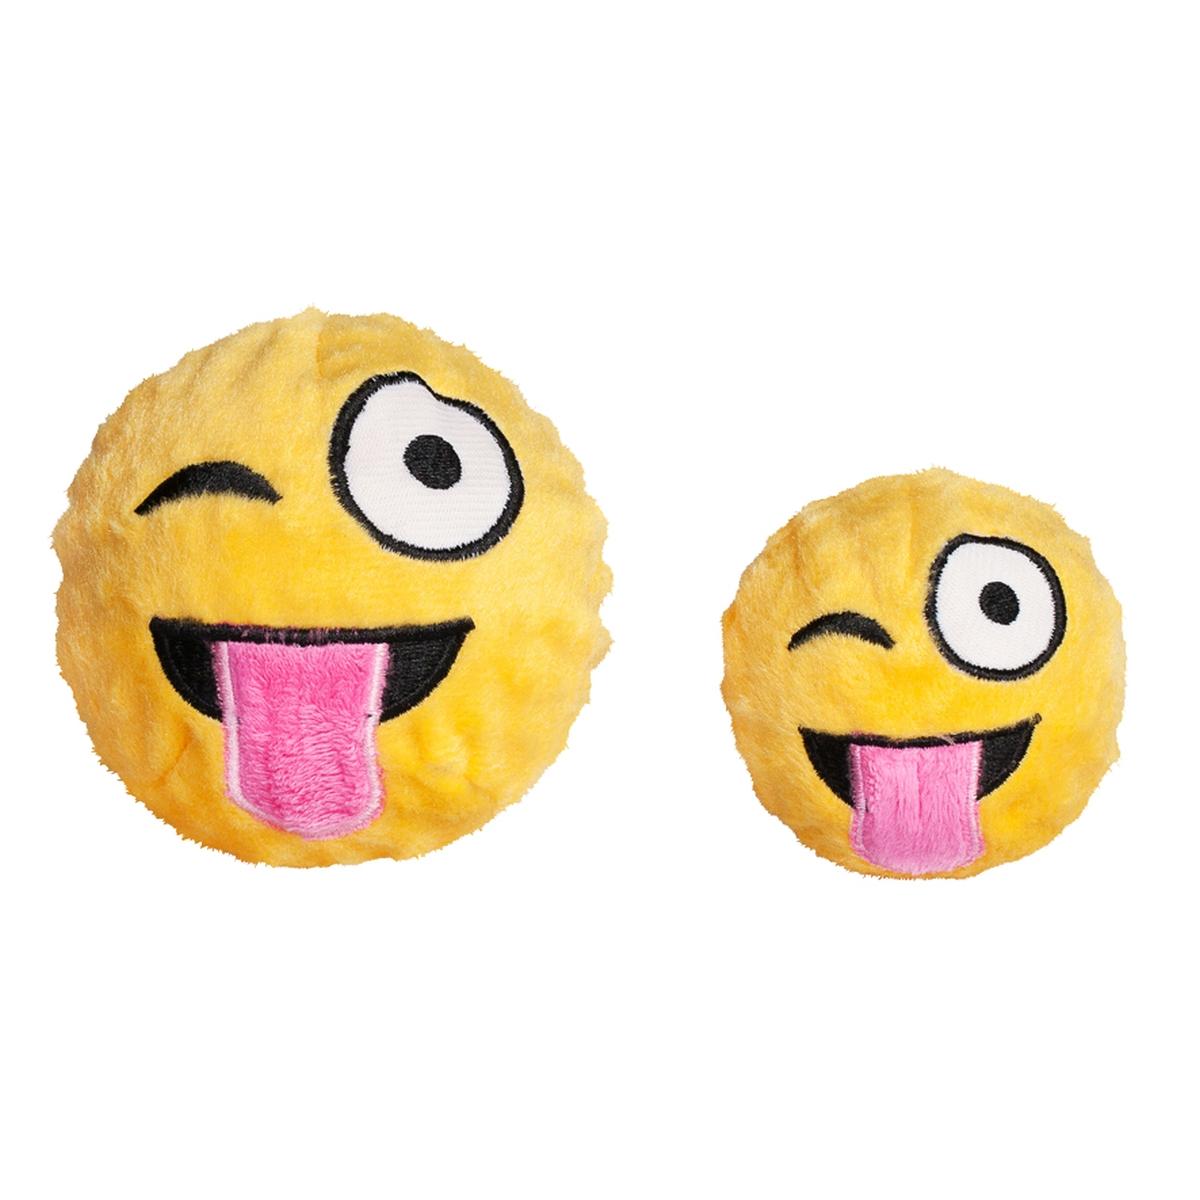 Wink emoji faball